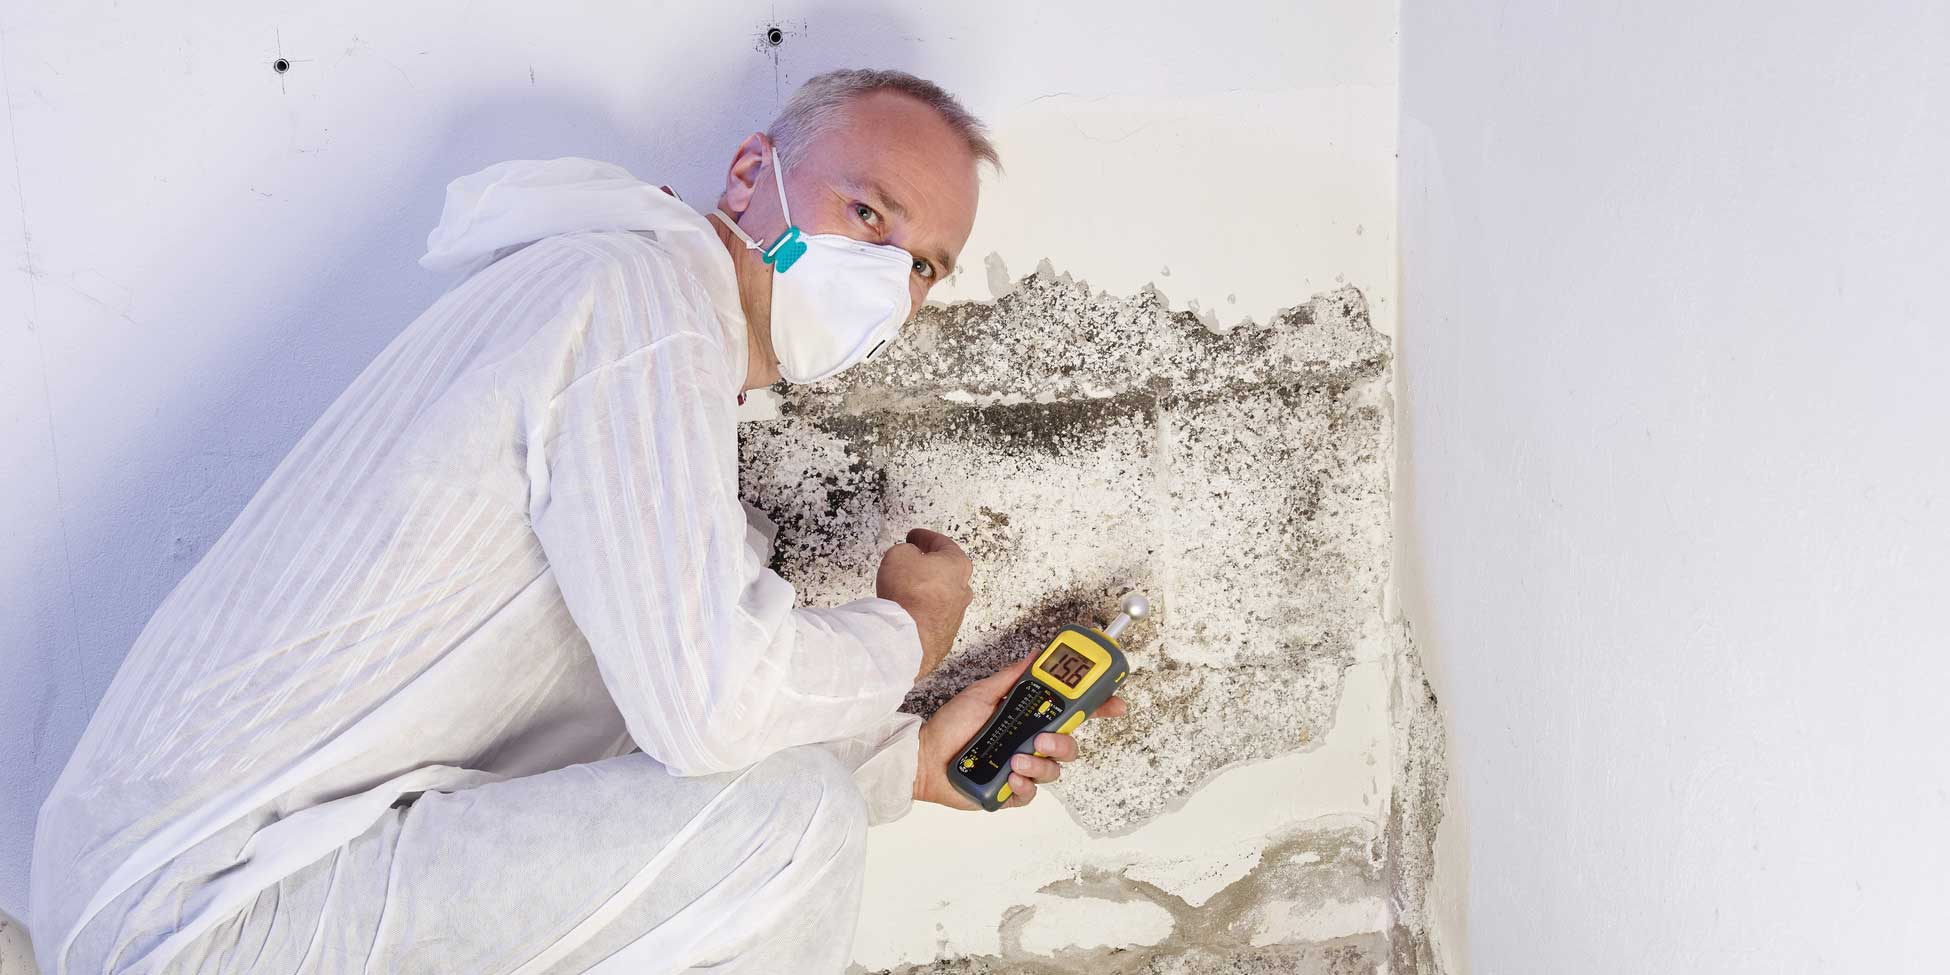 Mann vor schimmeliger Wand